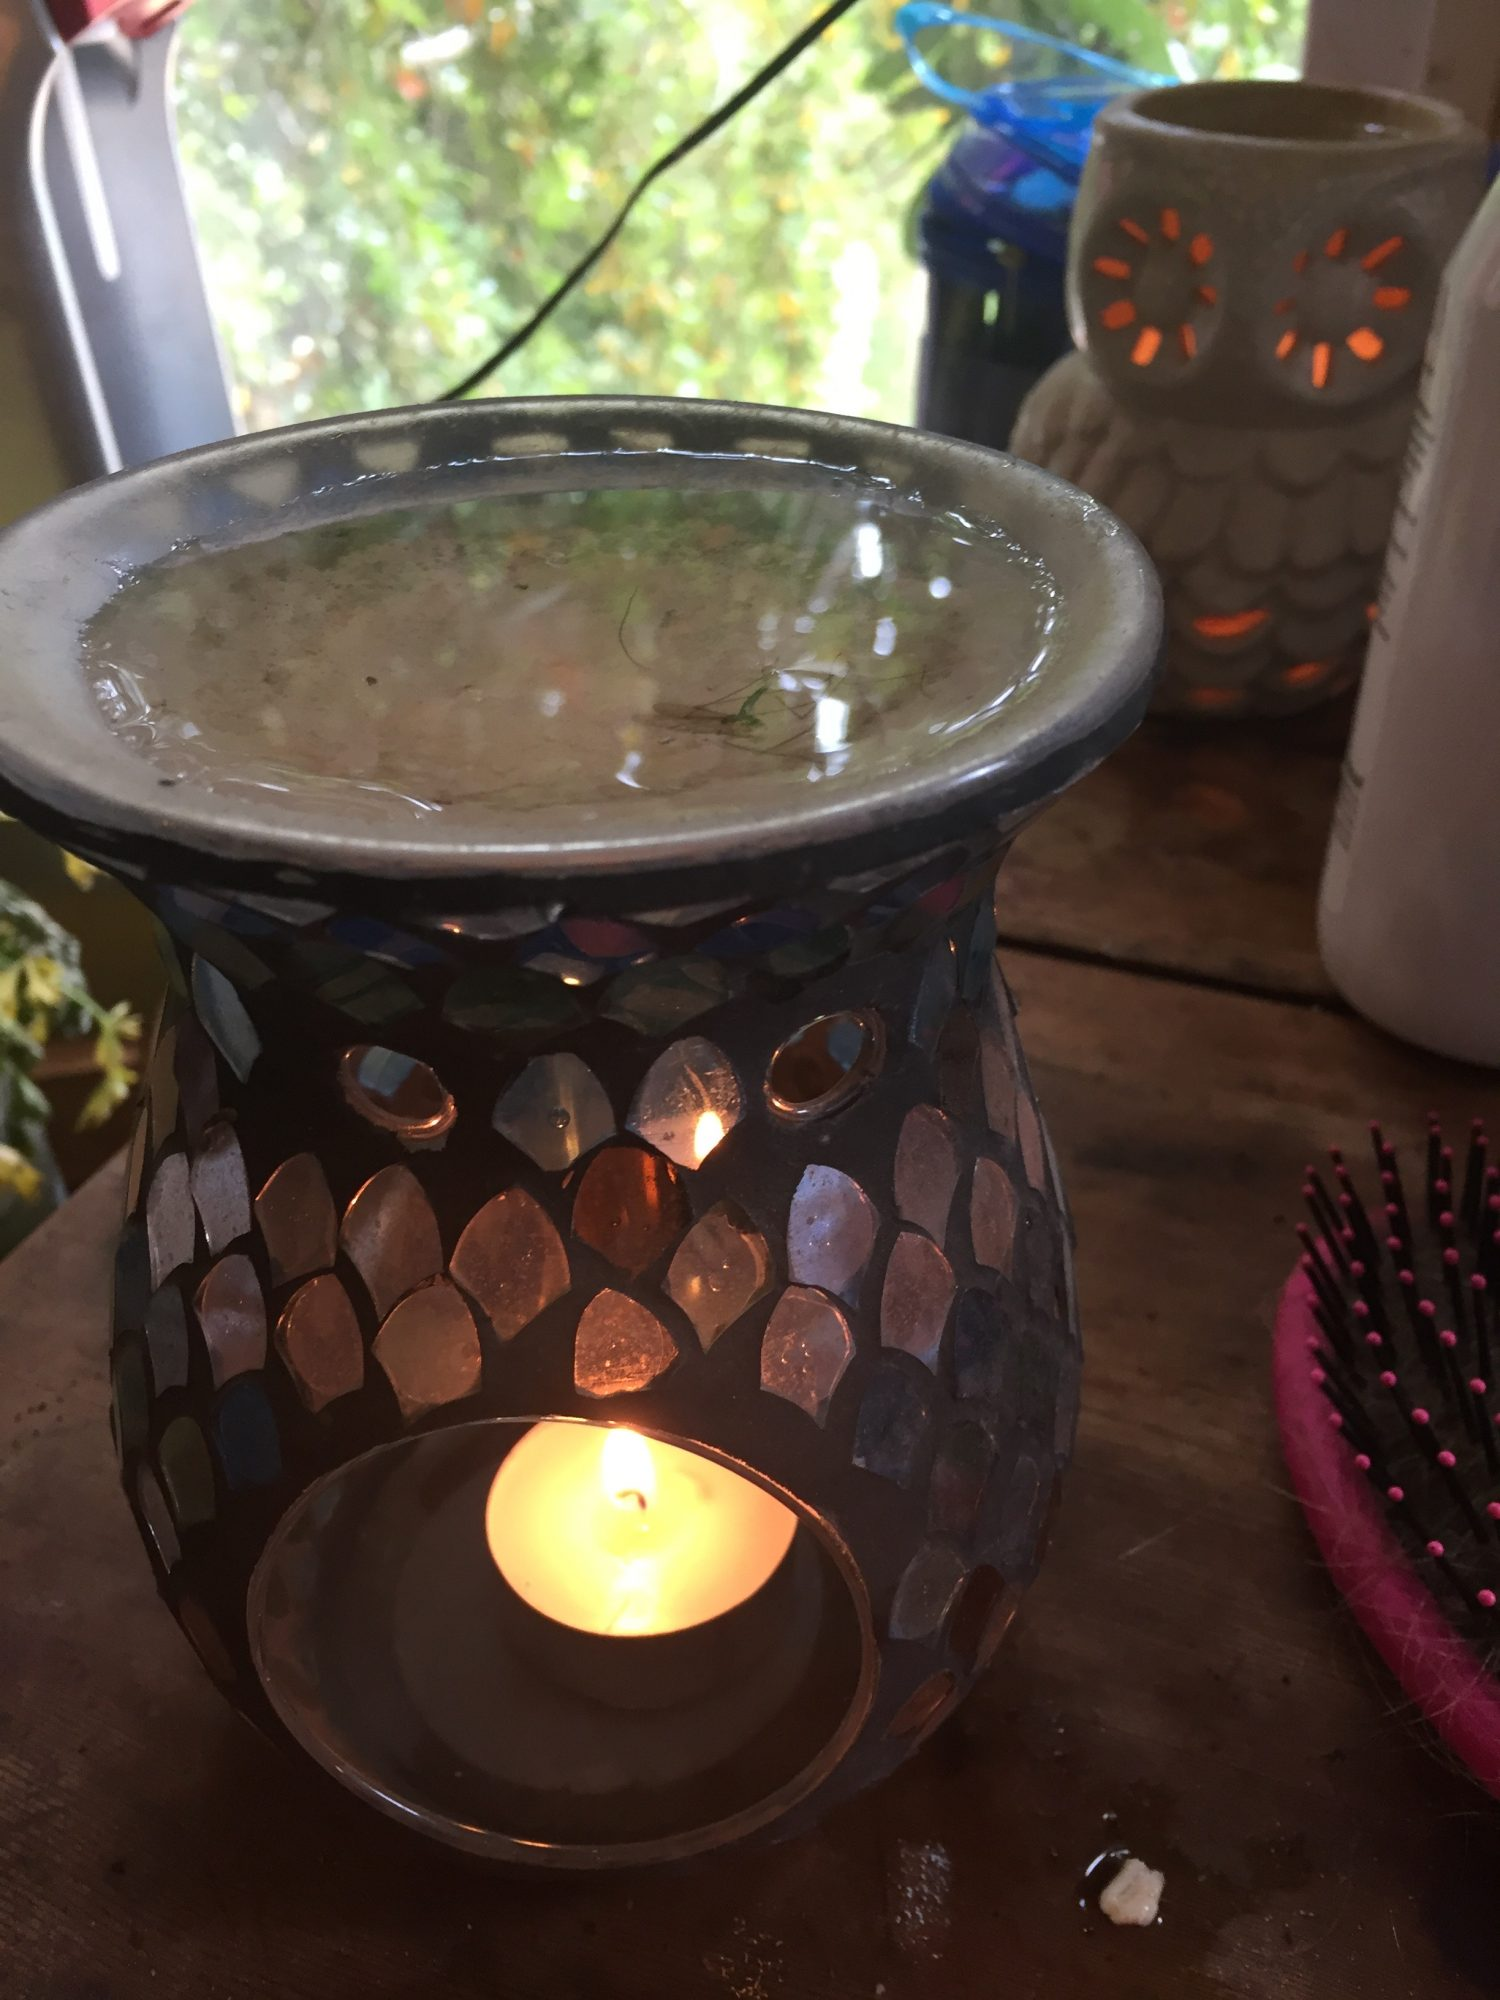 image of an essential oil burner